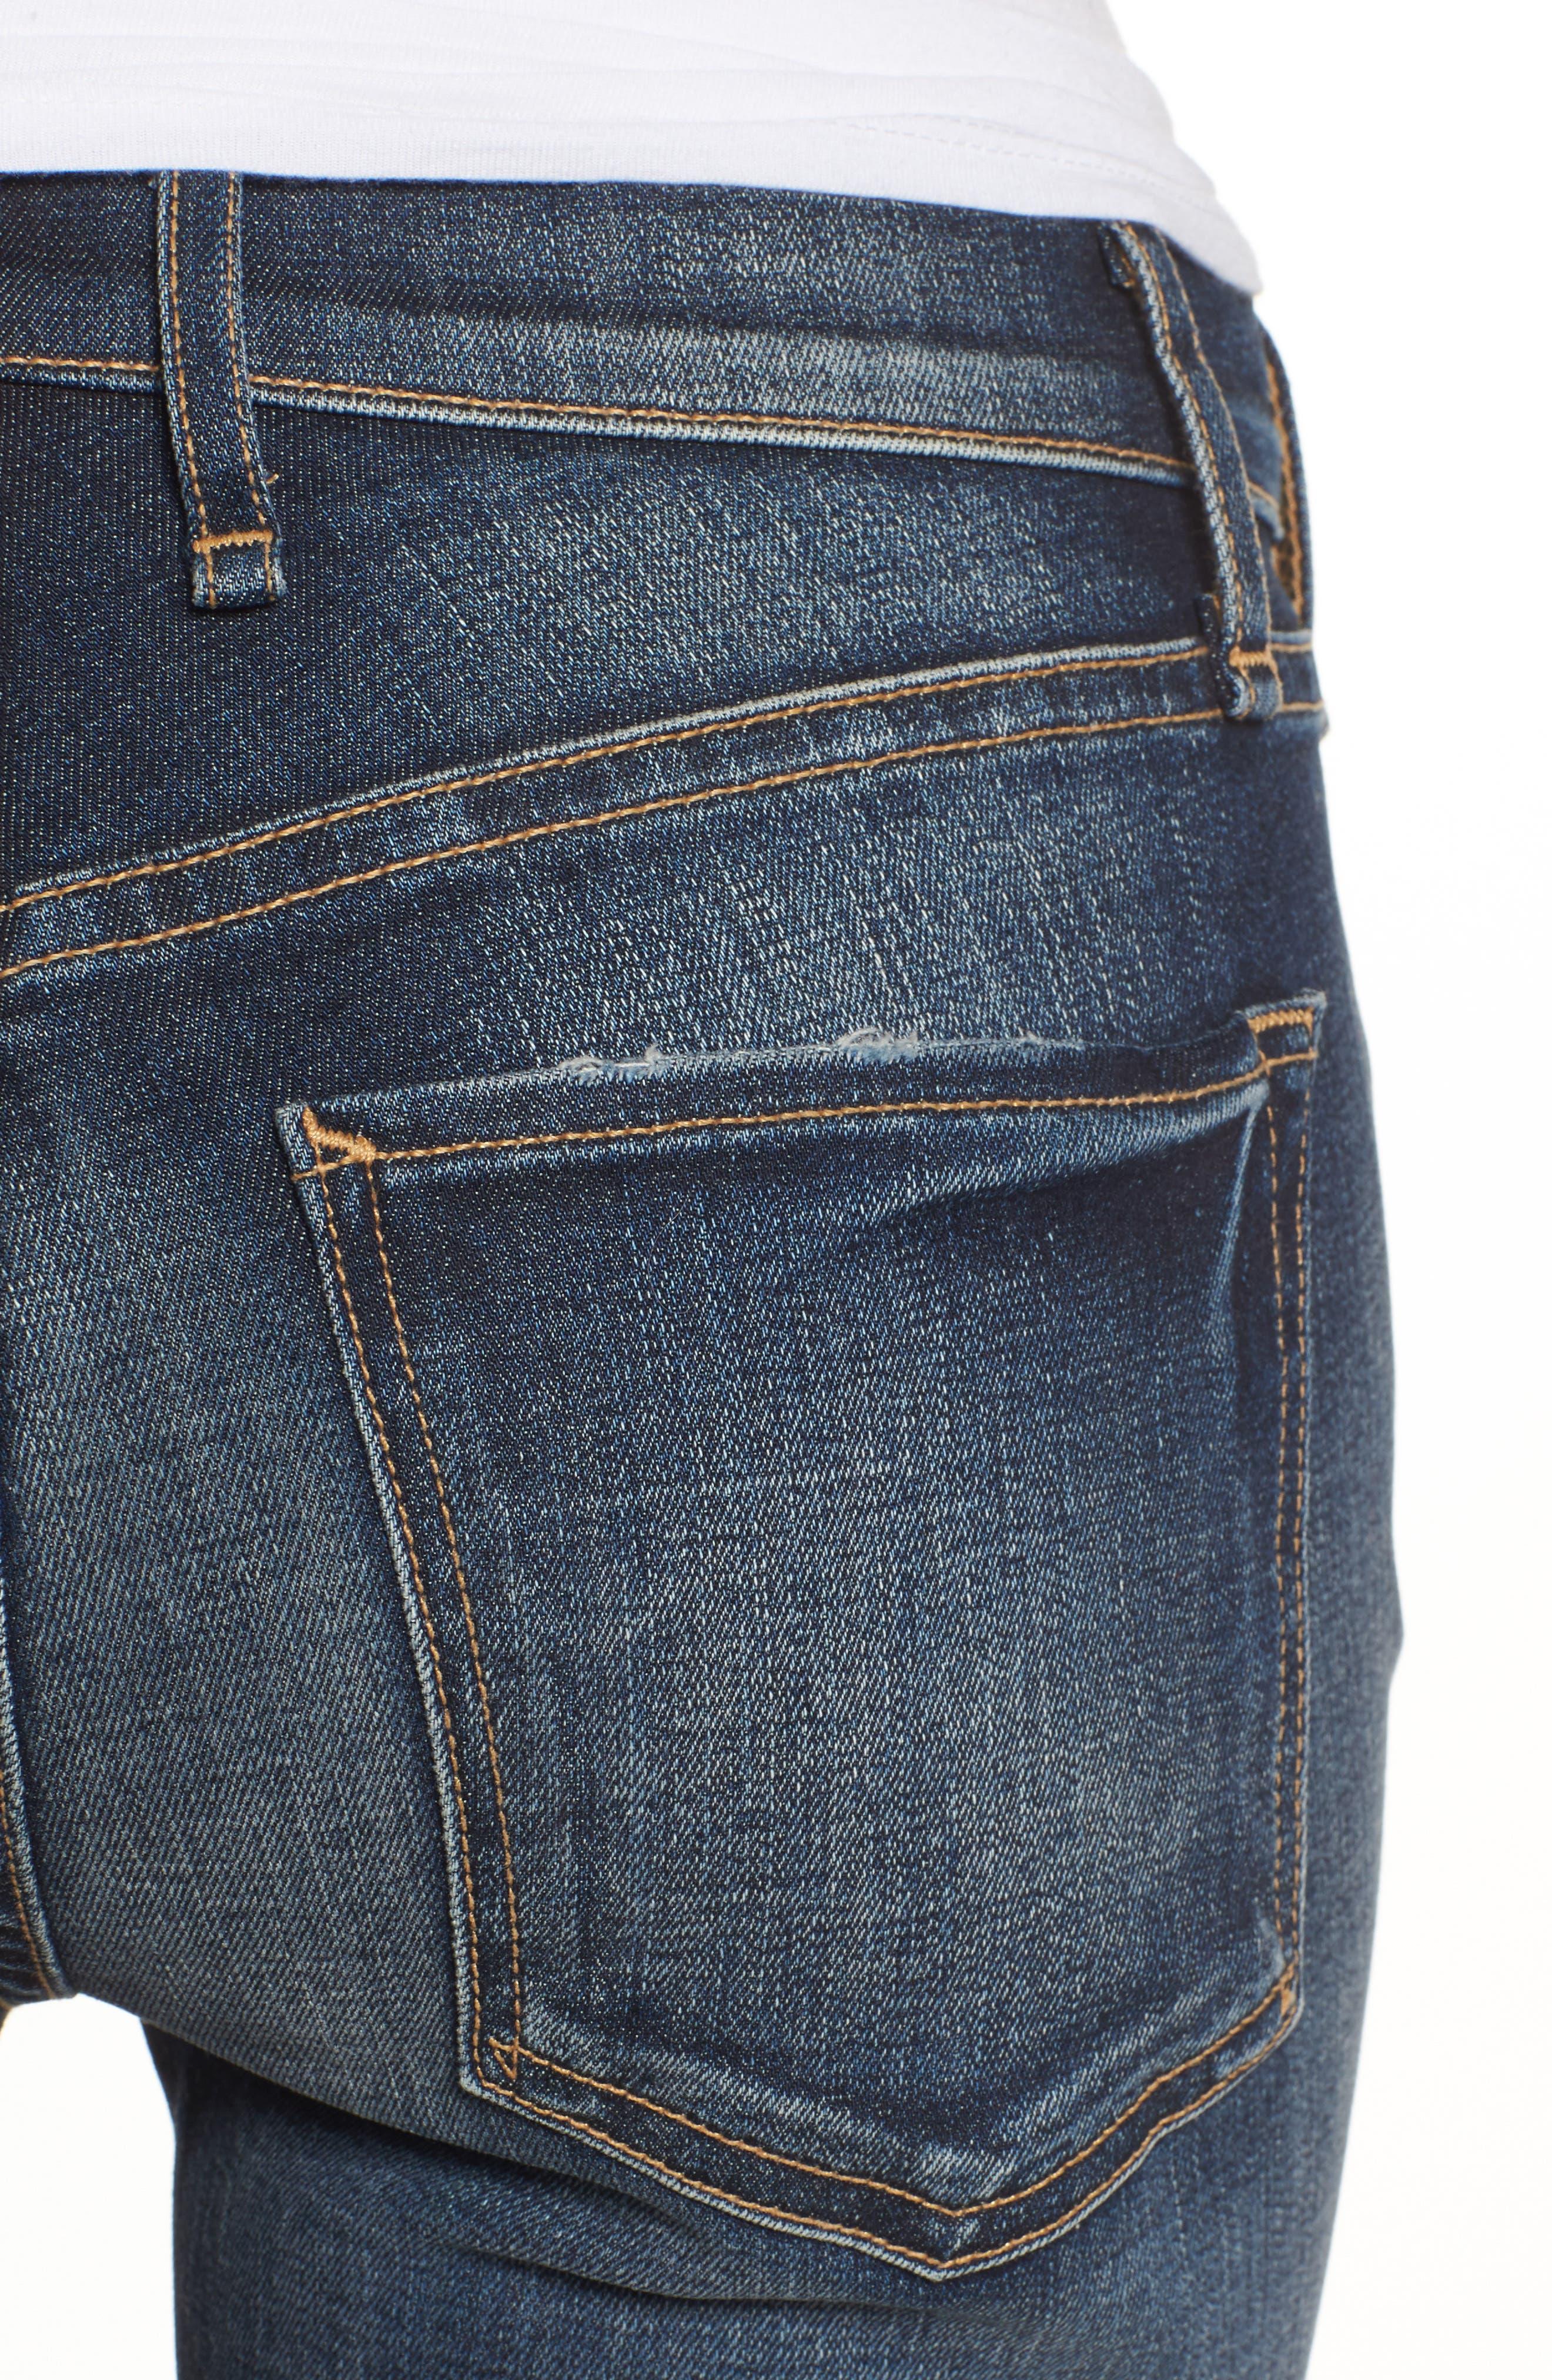 Newton High Waist Skinny Jeans,                             Alternate thumbnail 4, color,                             420